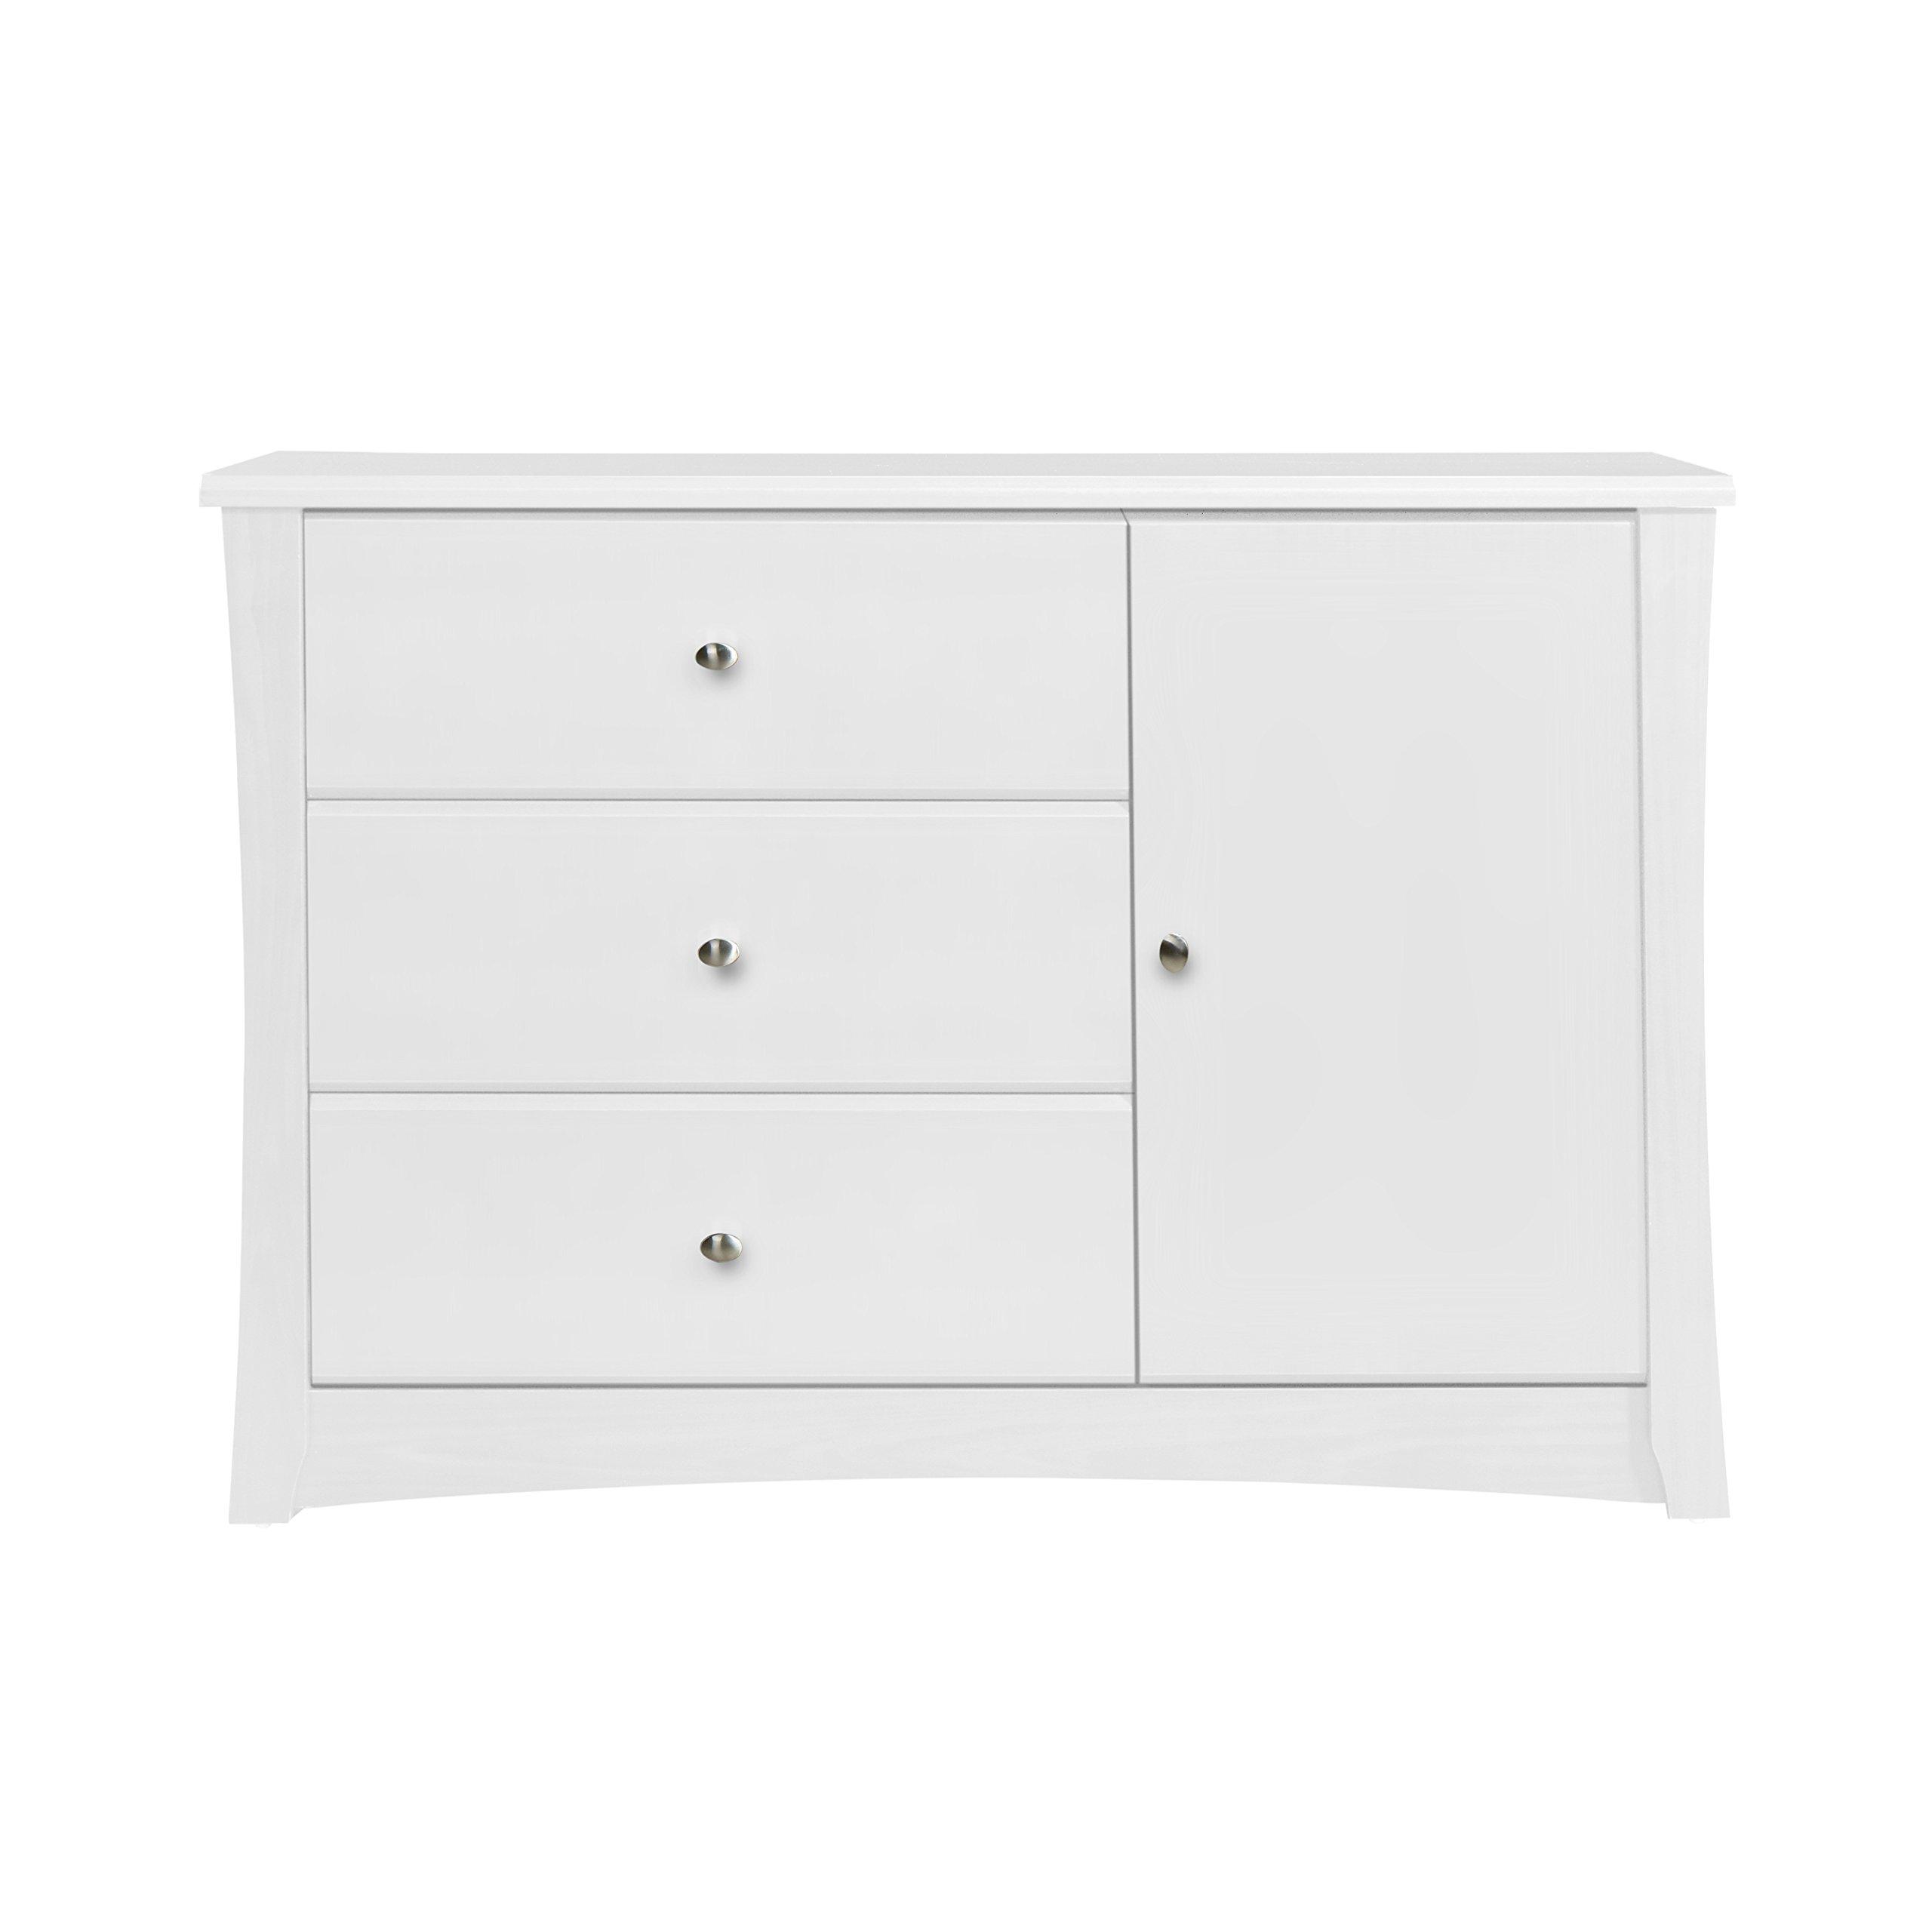 Storkcraft Crescent 3 Drawer Combo Dresser, White by Stork Craft (Image #4)